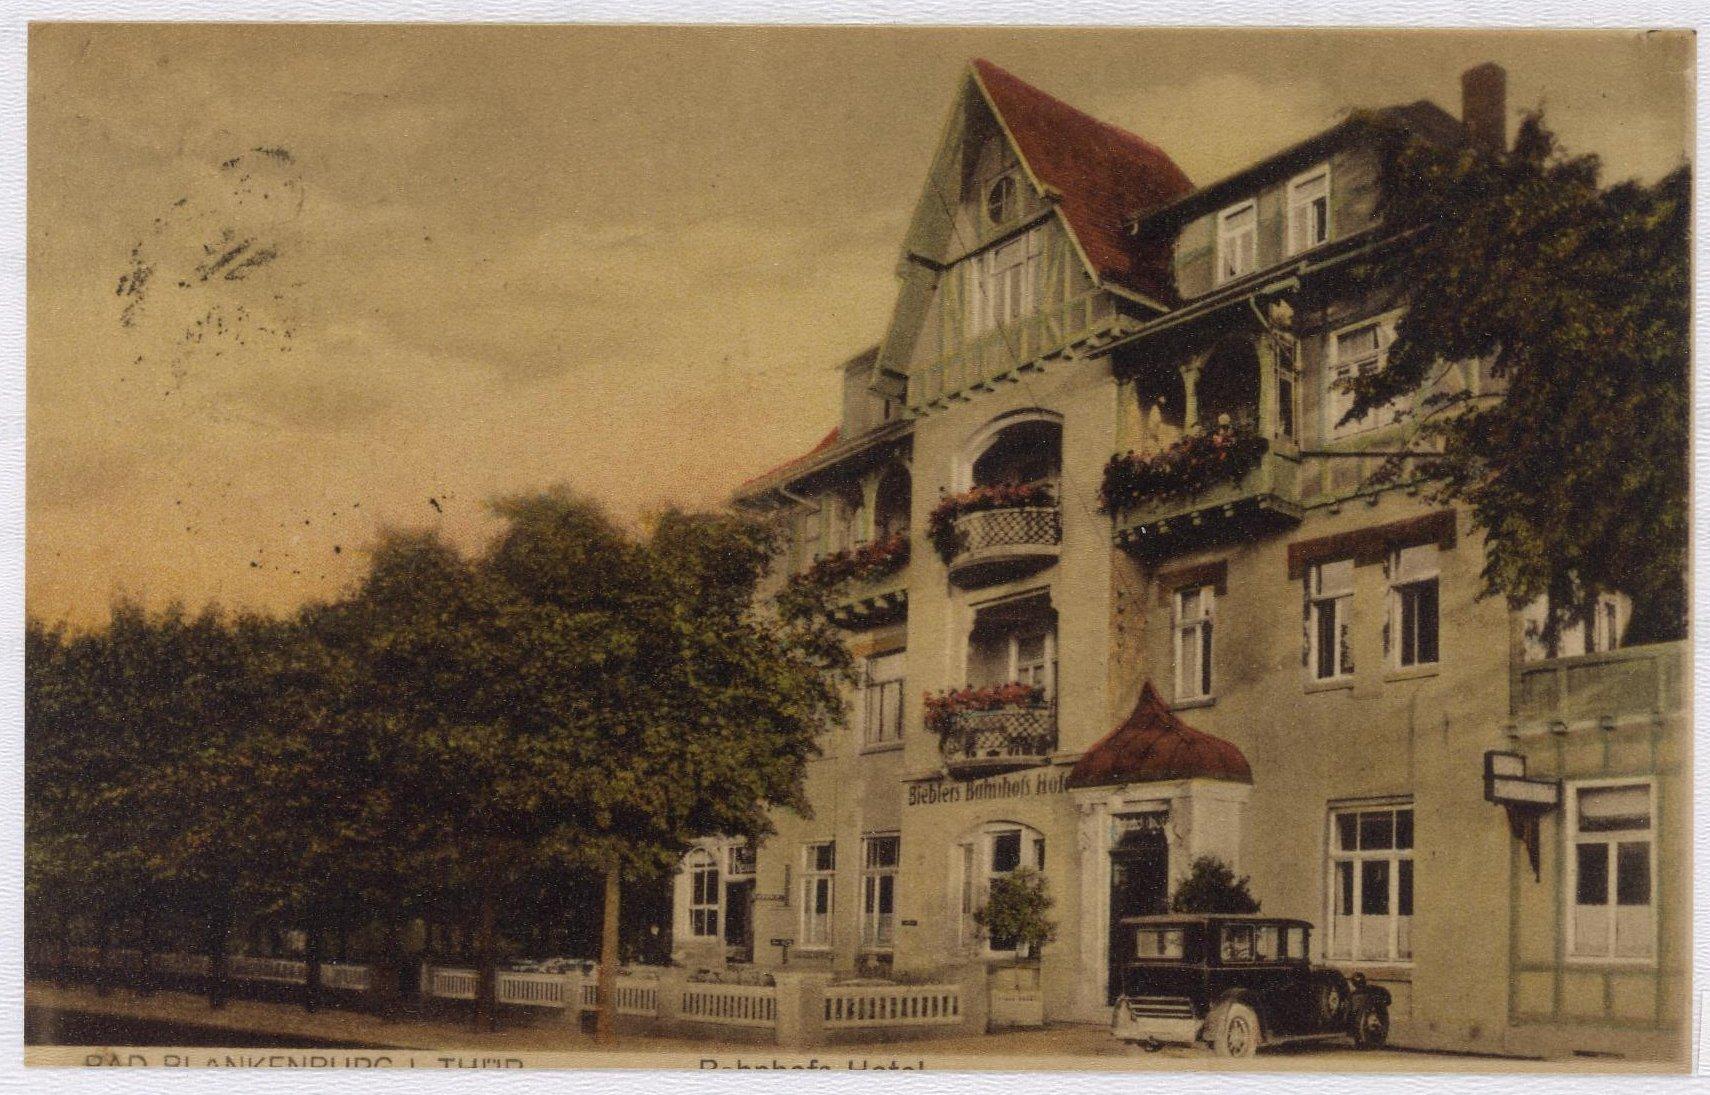 Bieblers Bahnhofshotel, die spätere BHG